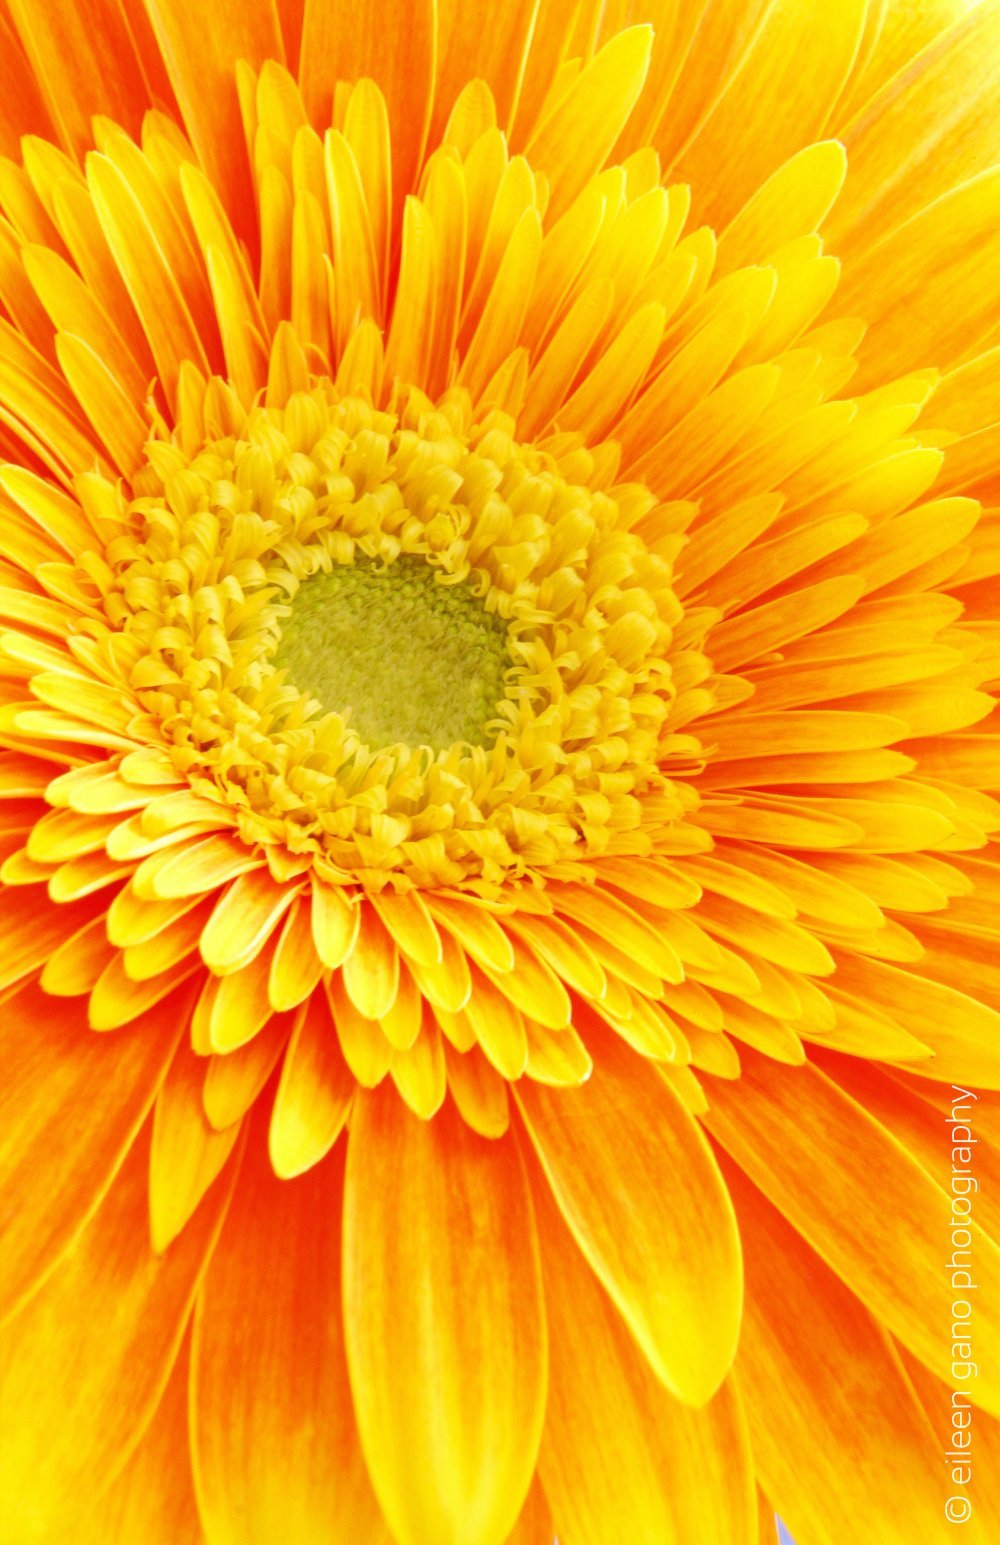 4-yellow-orange-gerber-daisy-close-up-eileen-gano